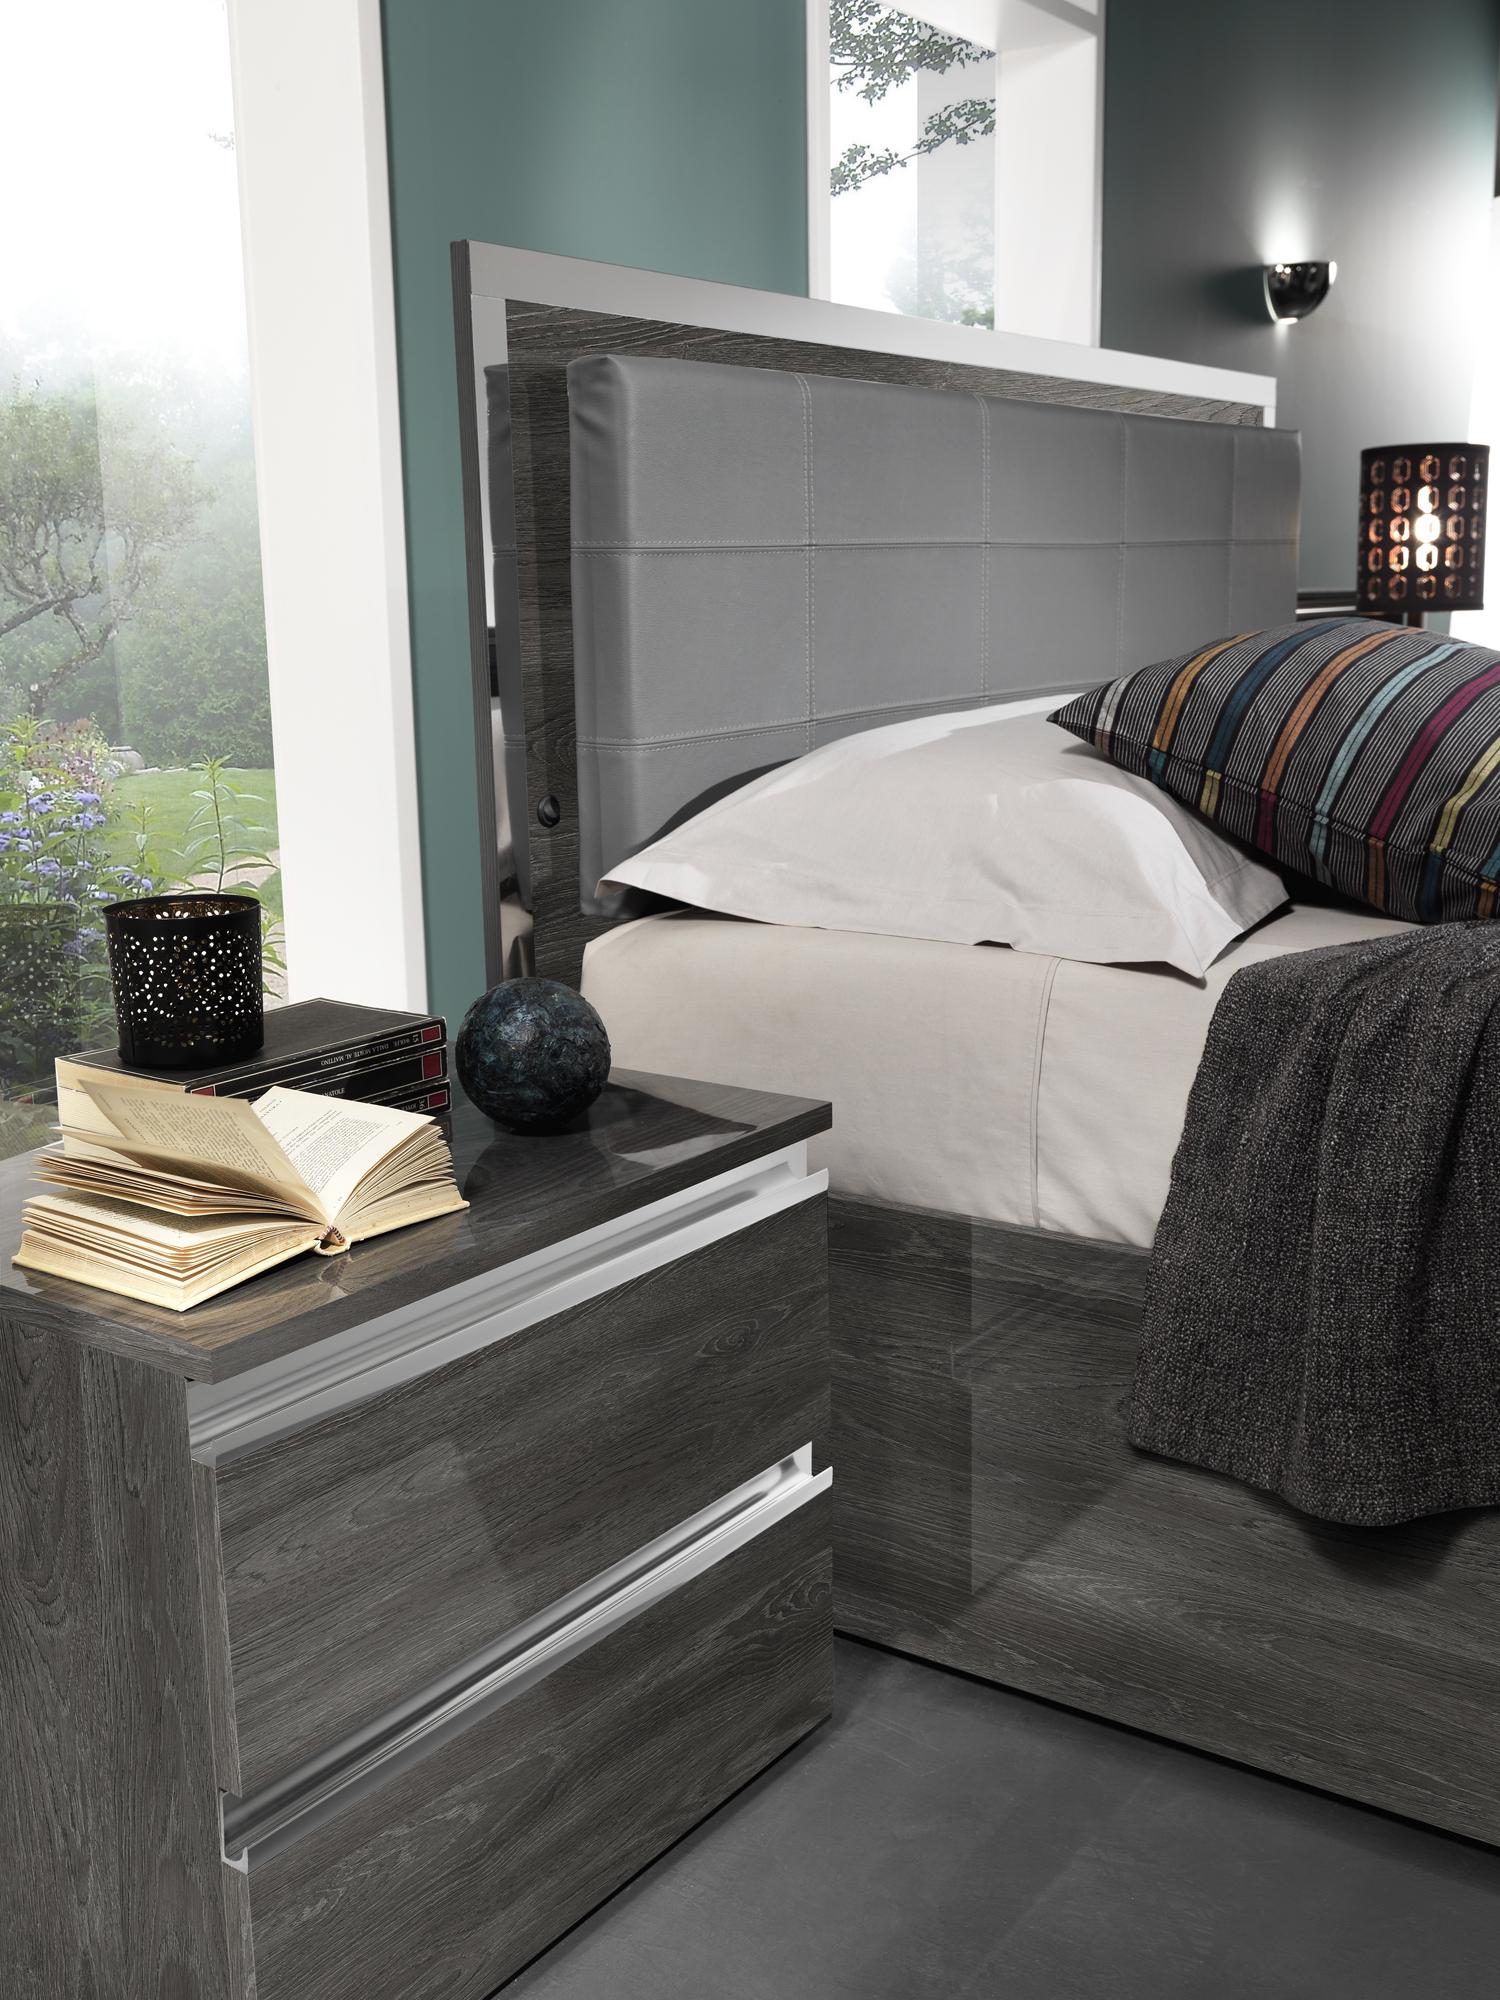 Oxford Bedroom, Modern Bedrooms, Bedroom Furniture